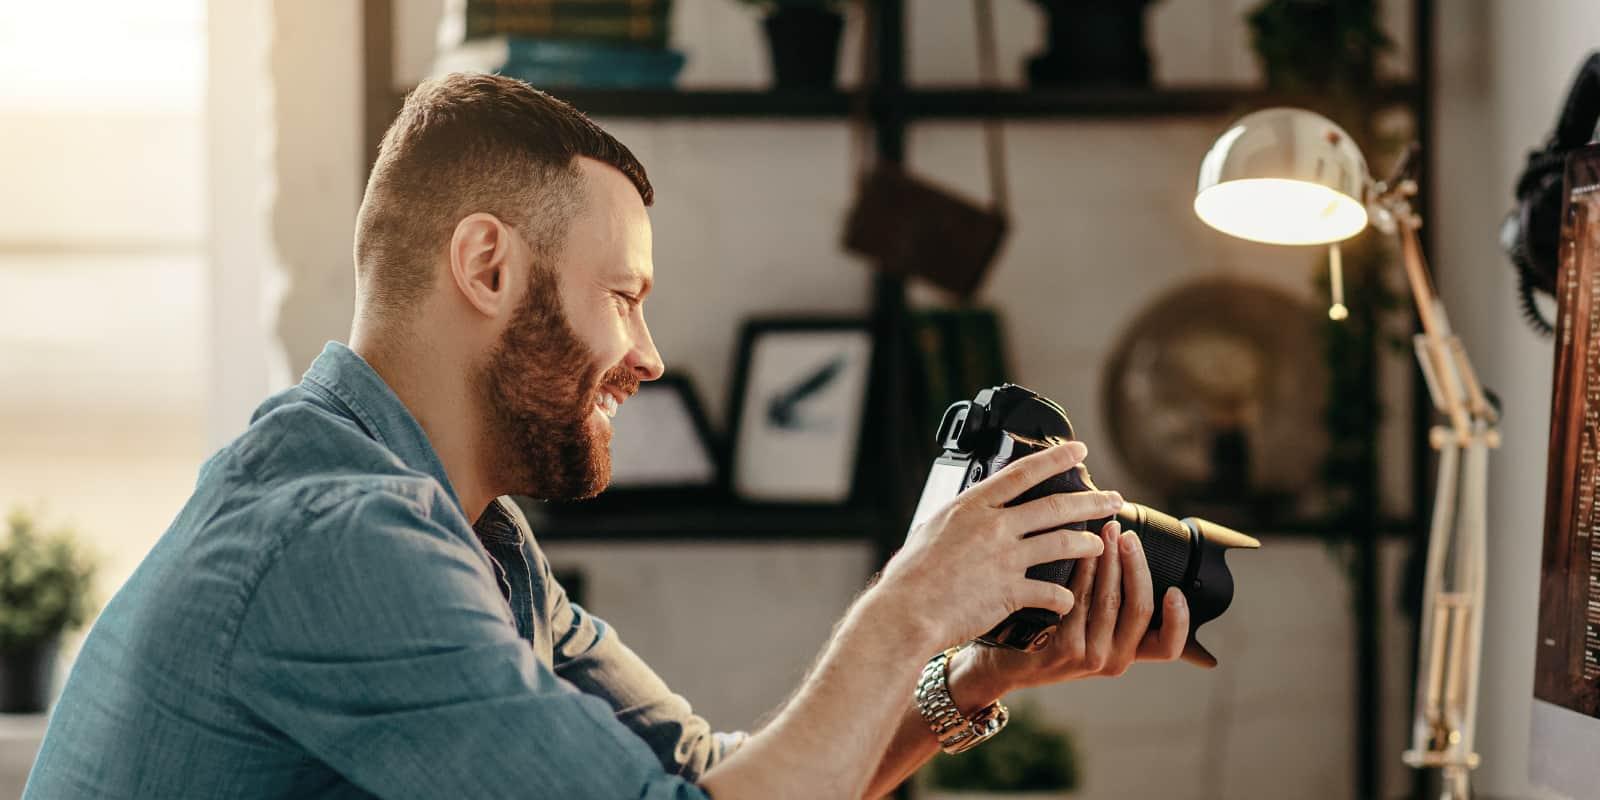 Man holding camera and smiling while looking at camera screen